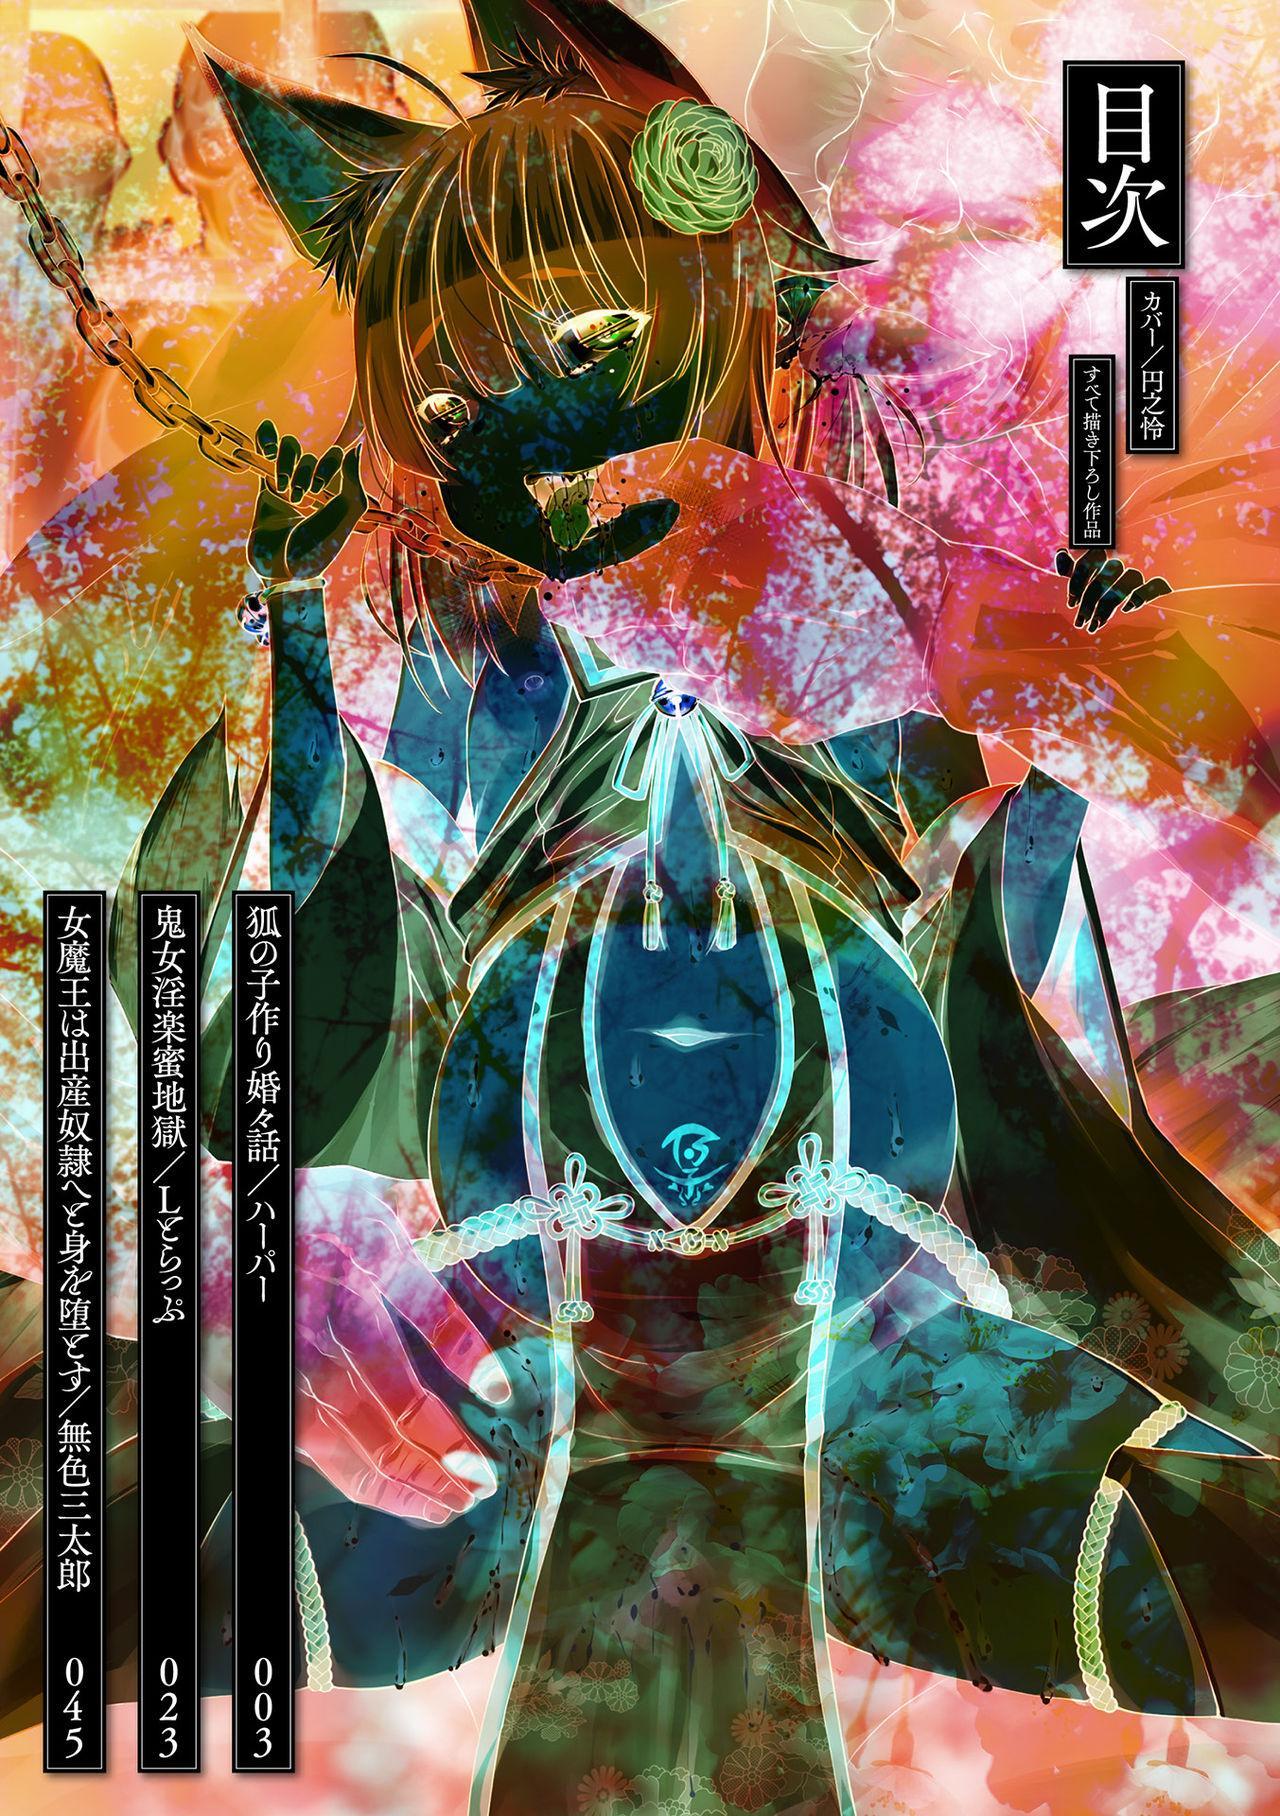 Loli-babaa Kyousei Tanetsuke Ecchi! Vol. 2 1